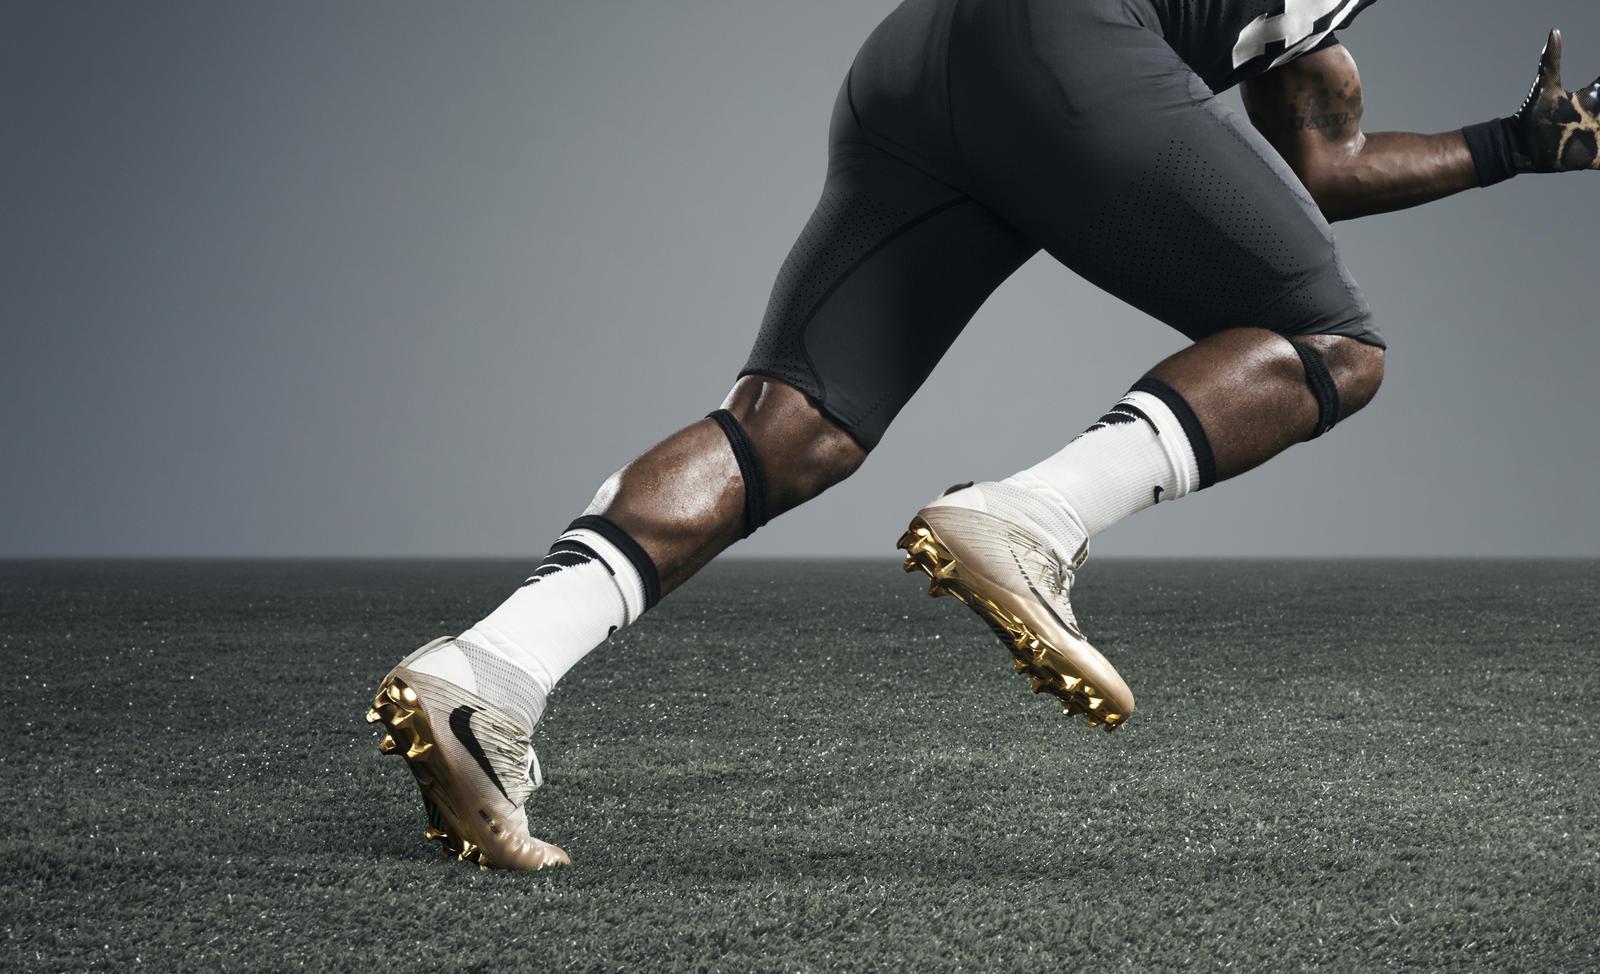 Untouchable Nike Vapor Football Cleats